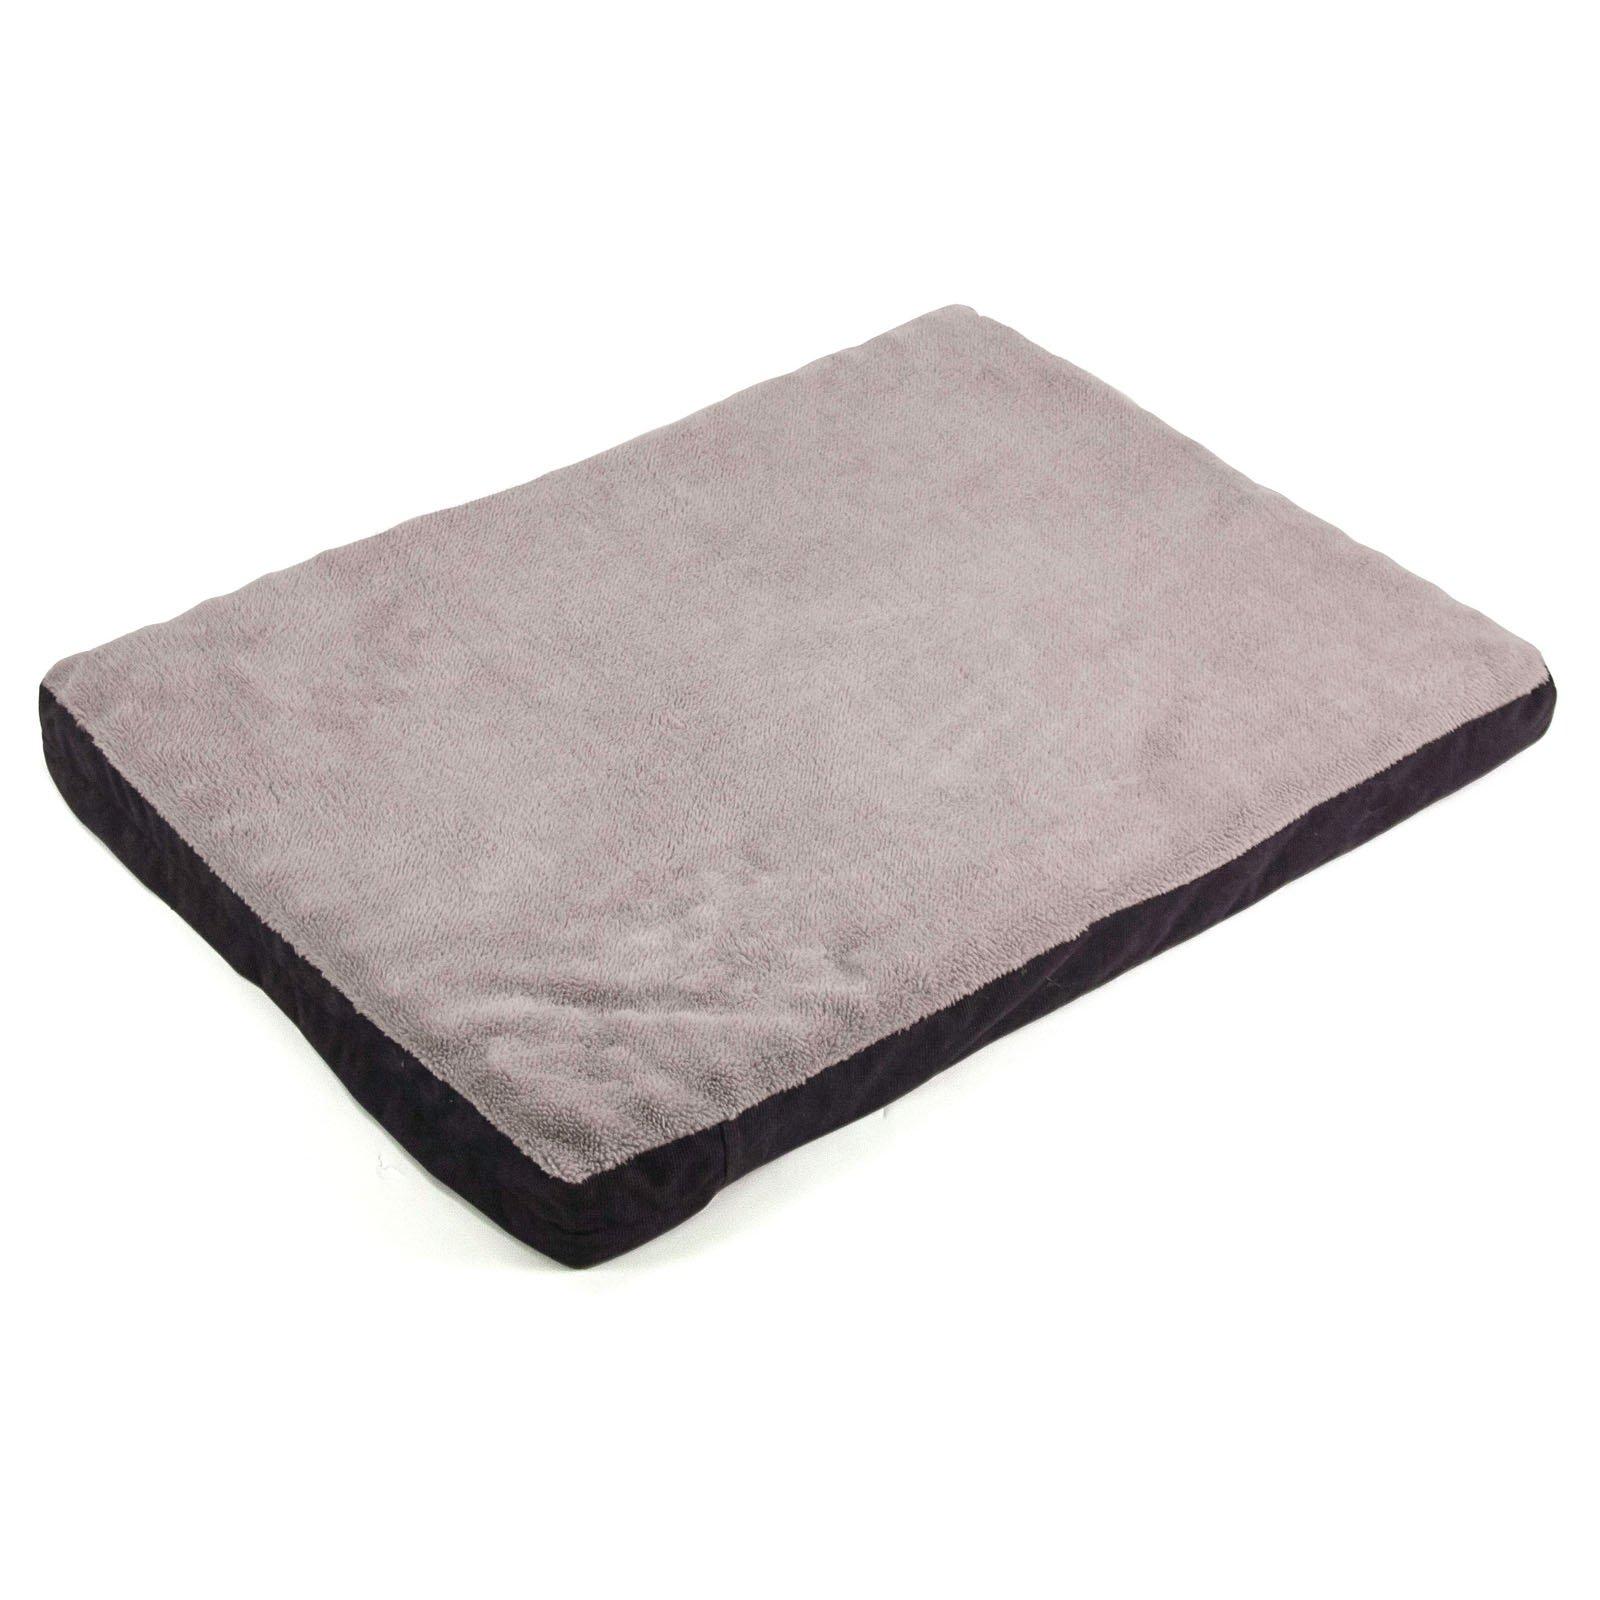 dallas manufacturing company orthopedic premium pet bed - walmart